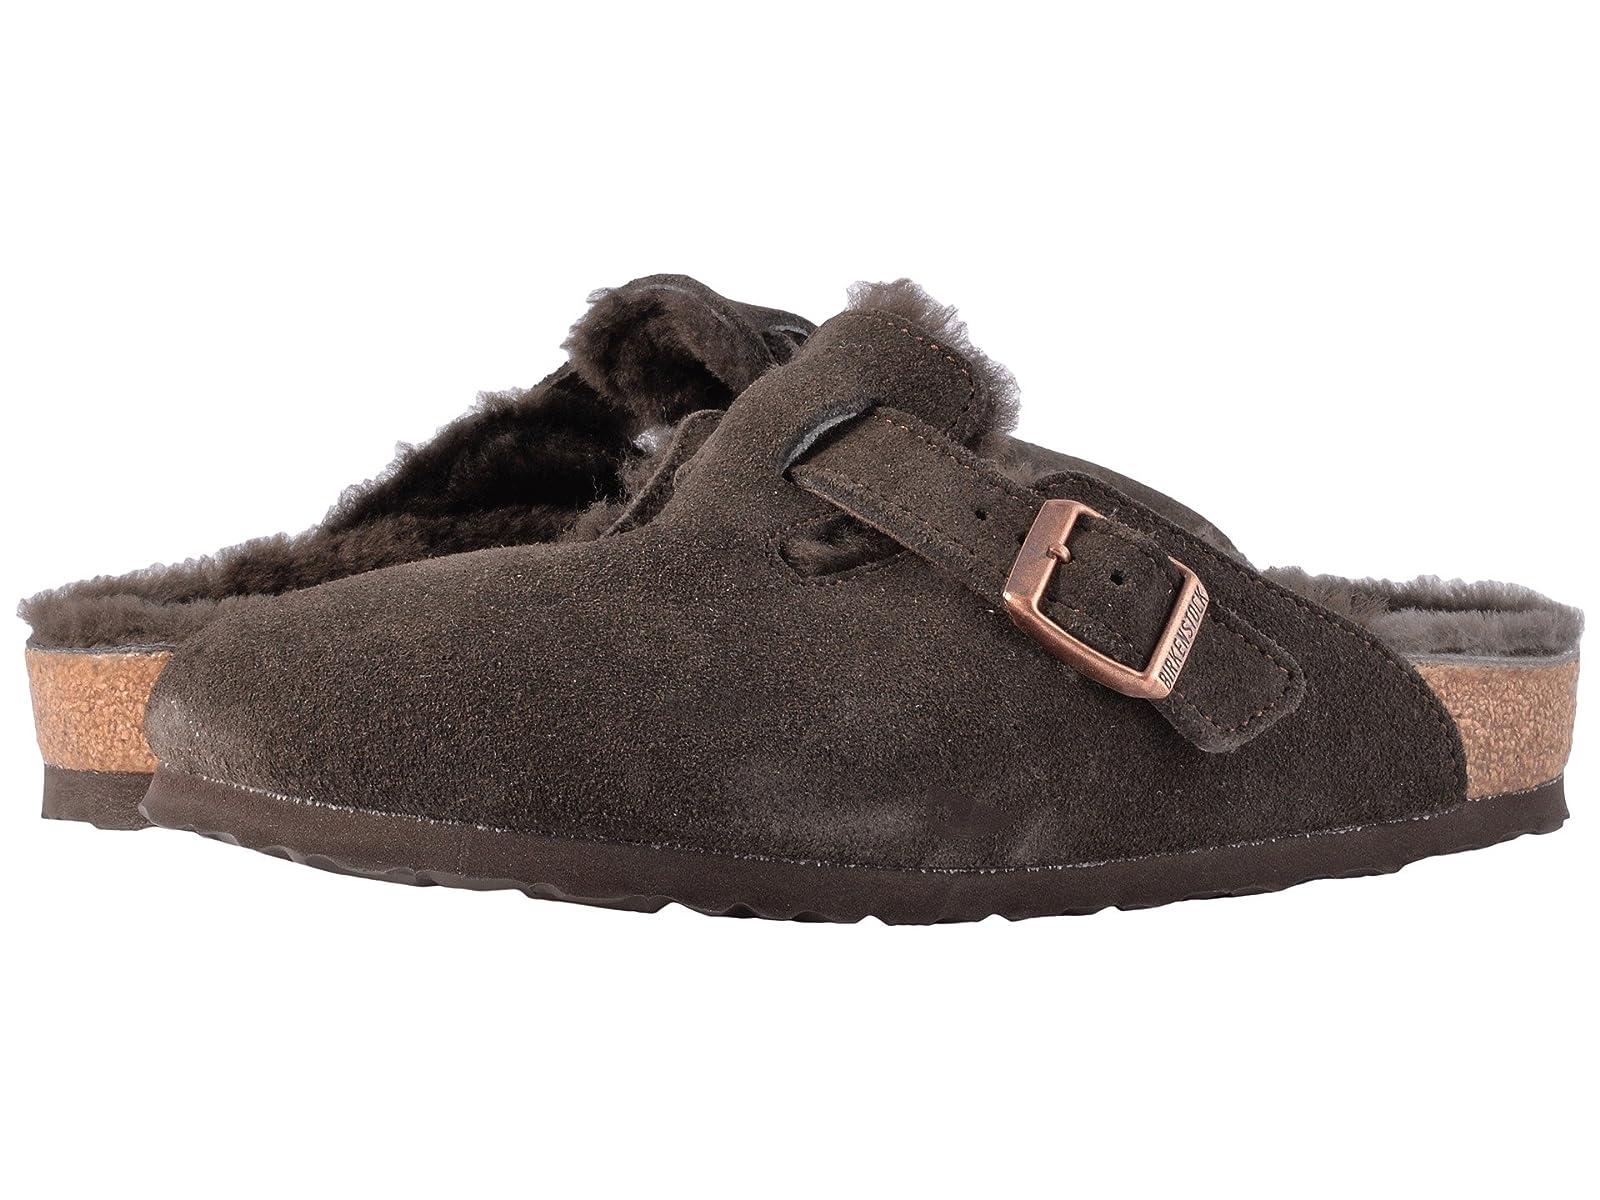 Birkenstock Boston ShearlingCheap and distinctive eye-catching shoes